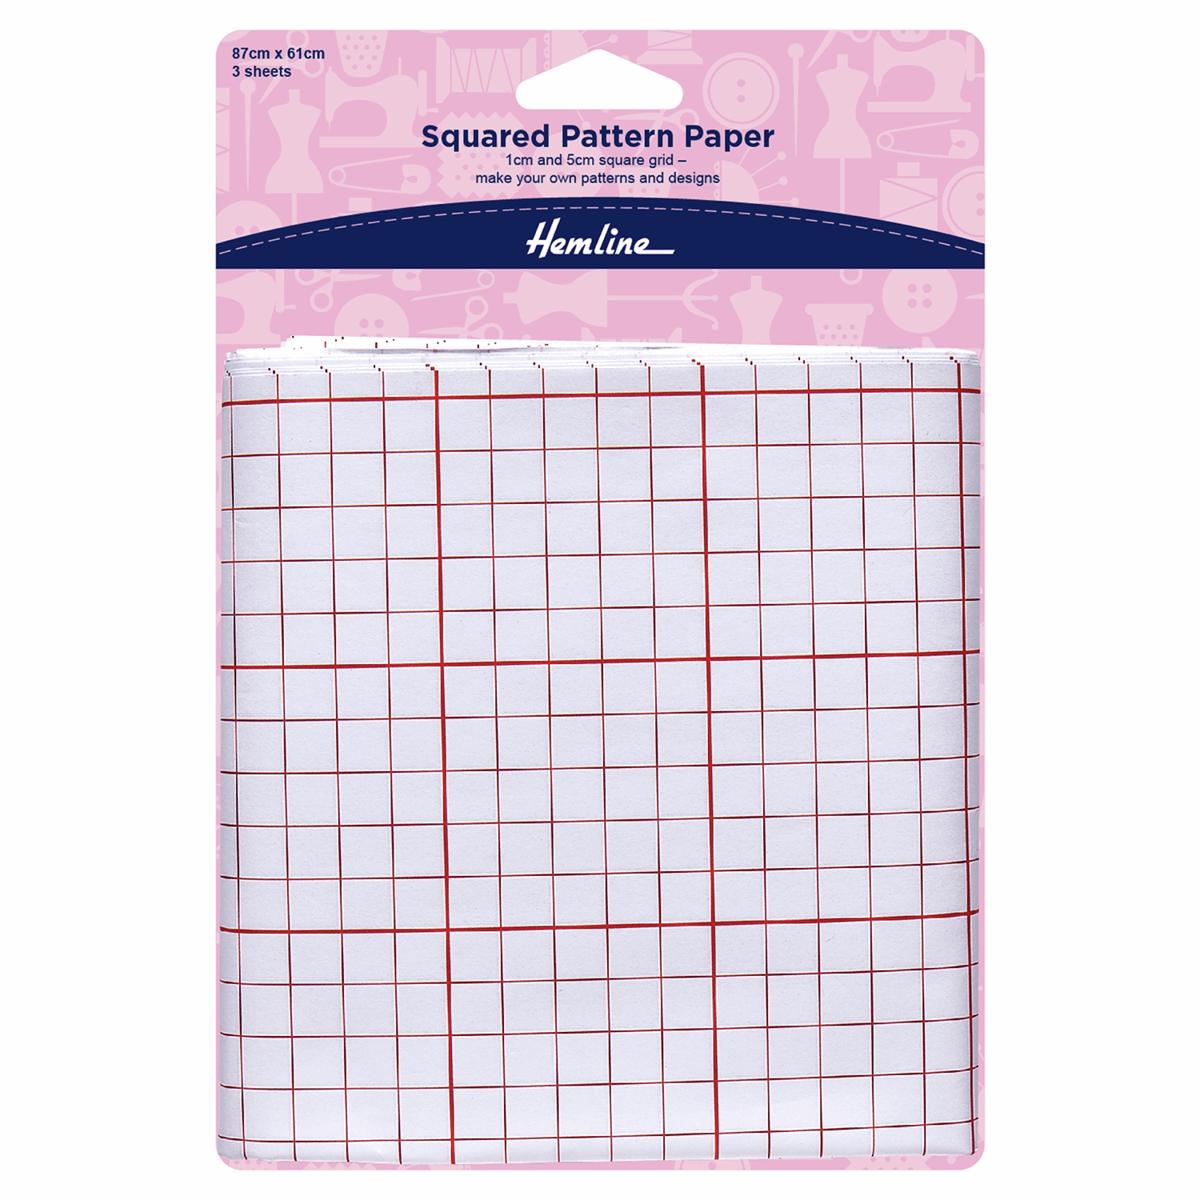 Squared Pattern Paper Dressmaking Sewing Design Cutting 87cm x 61cm 3 Sheets